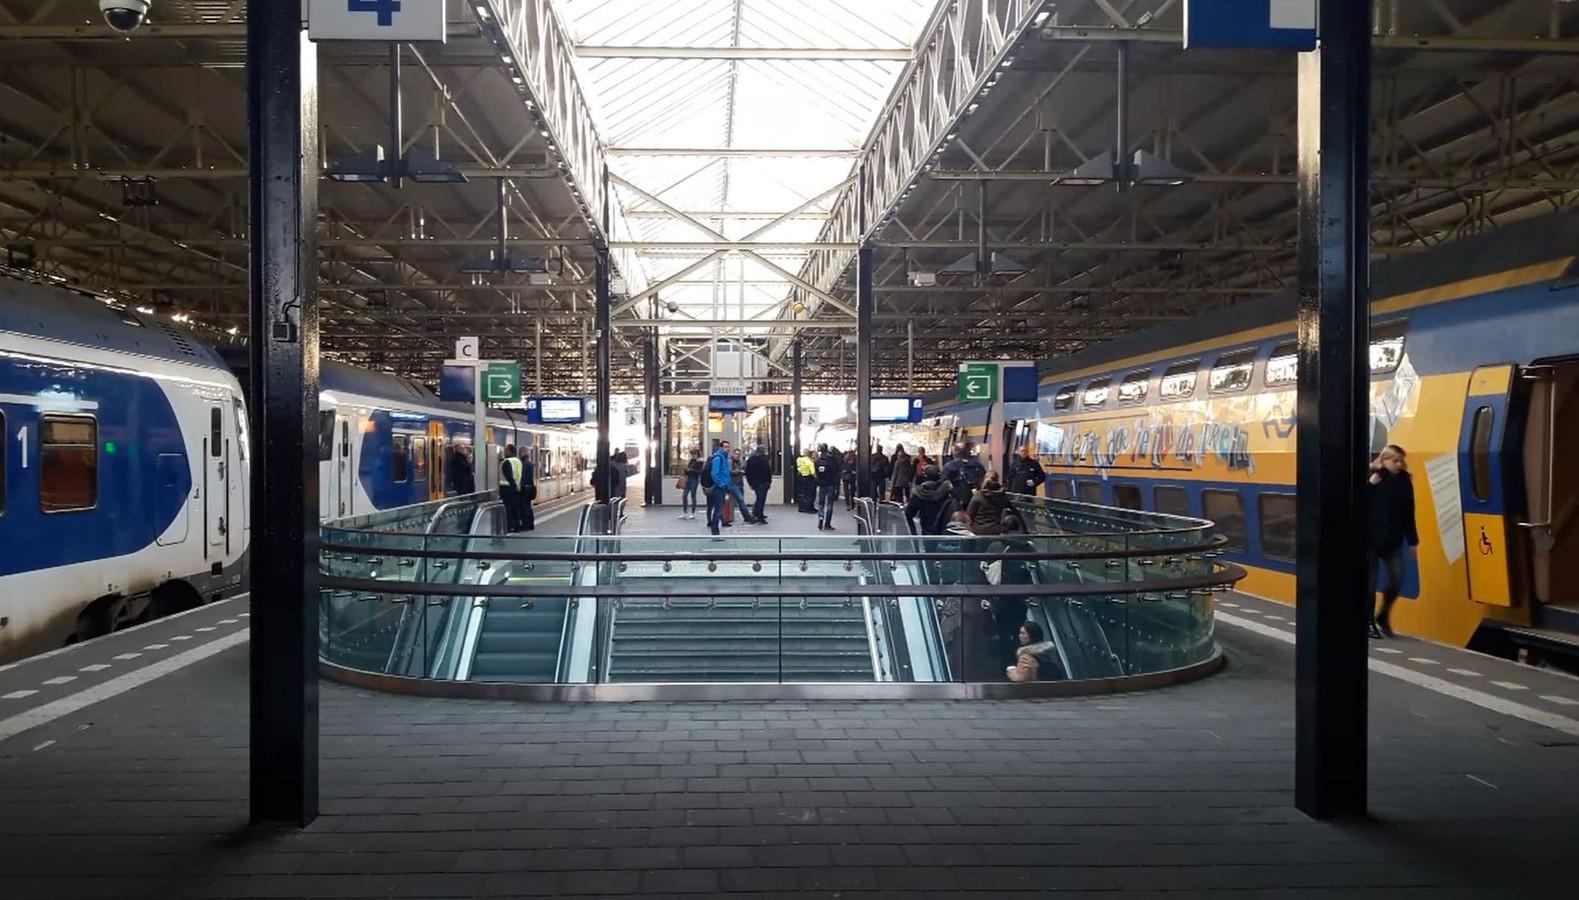 Station Eindhoven